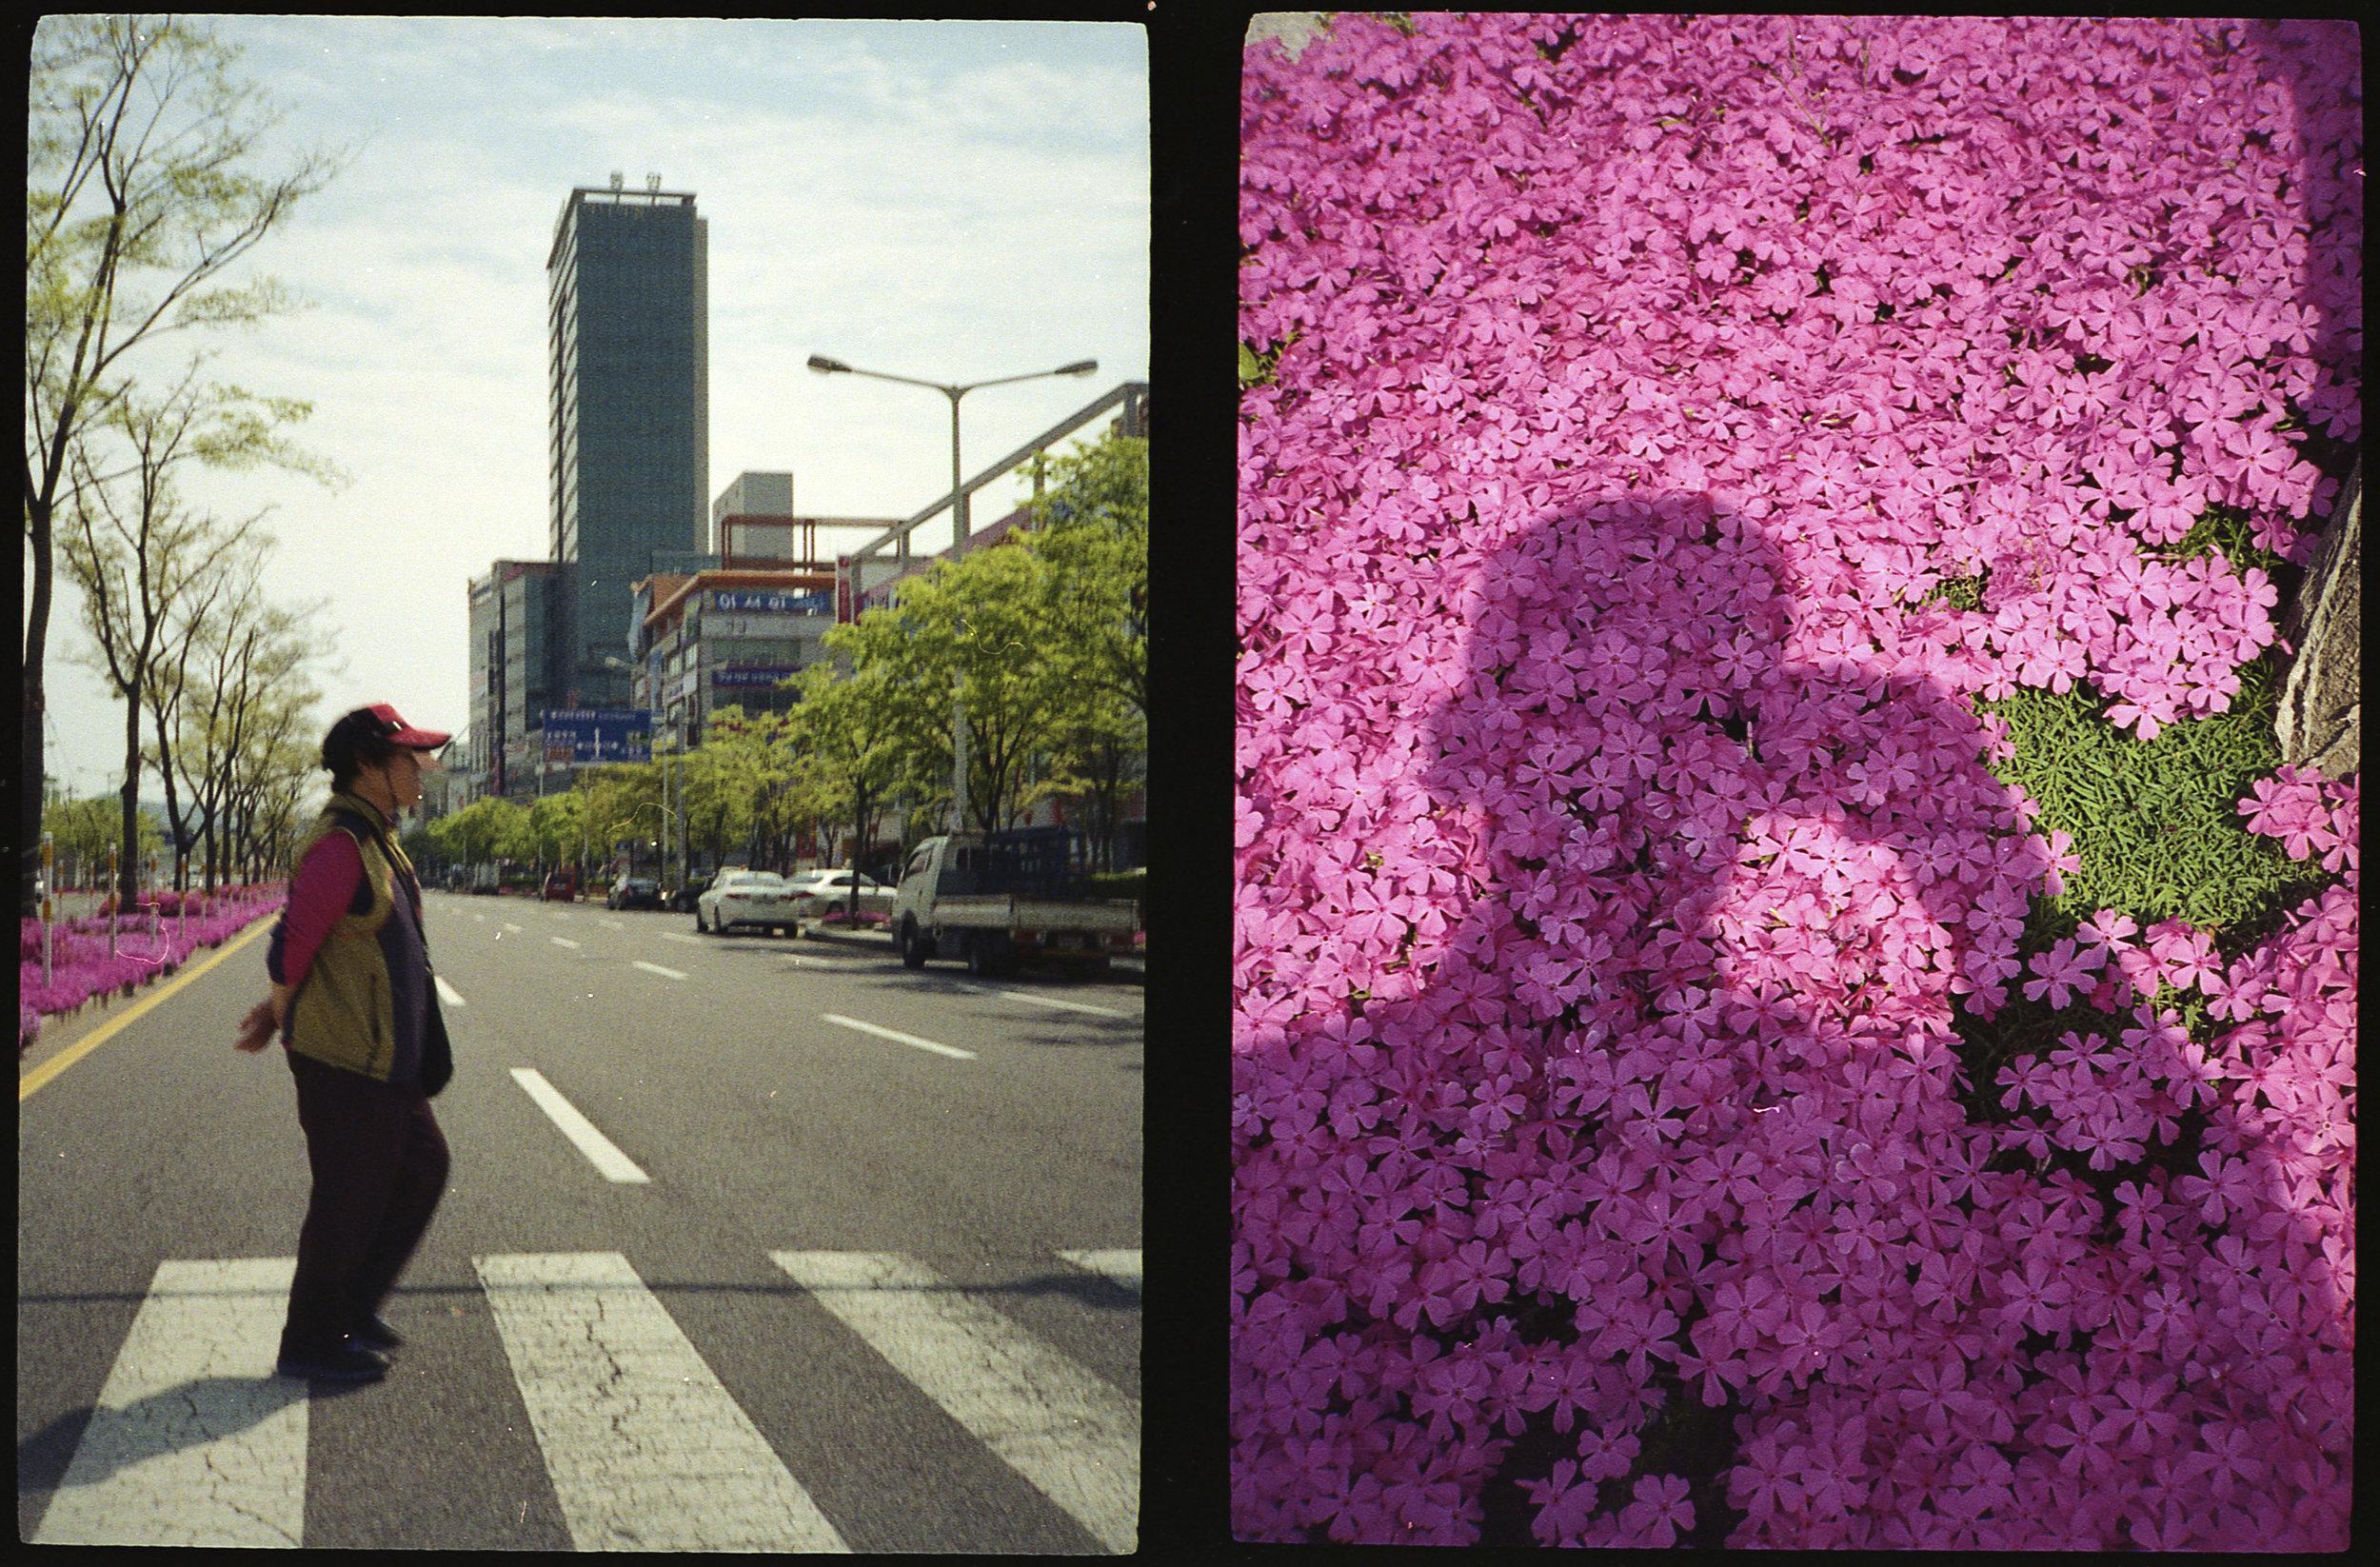 Crosswalk and Beautiful Flowers